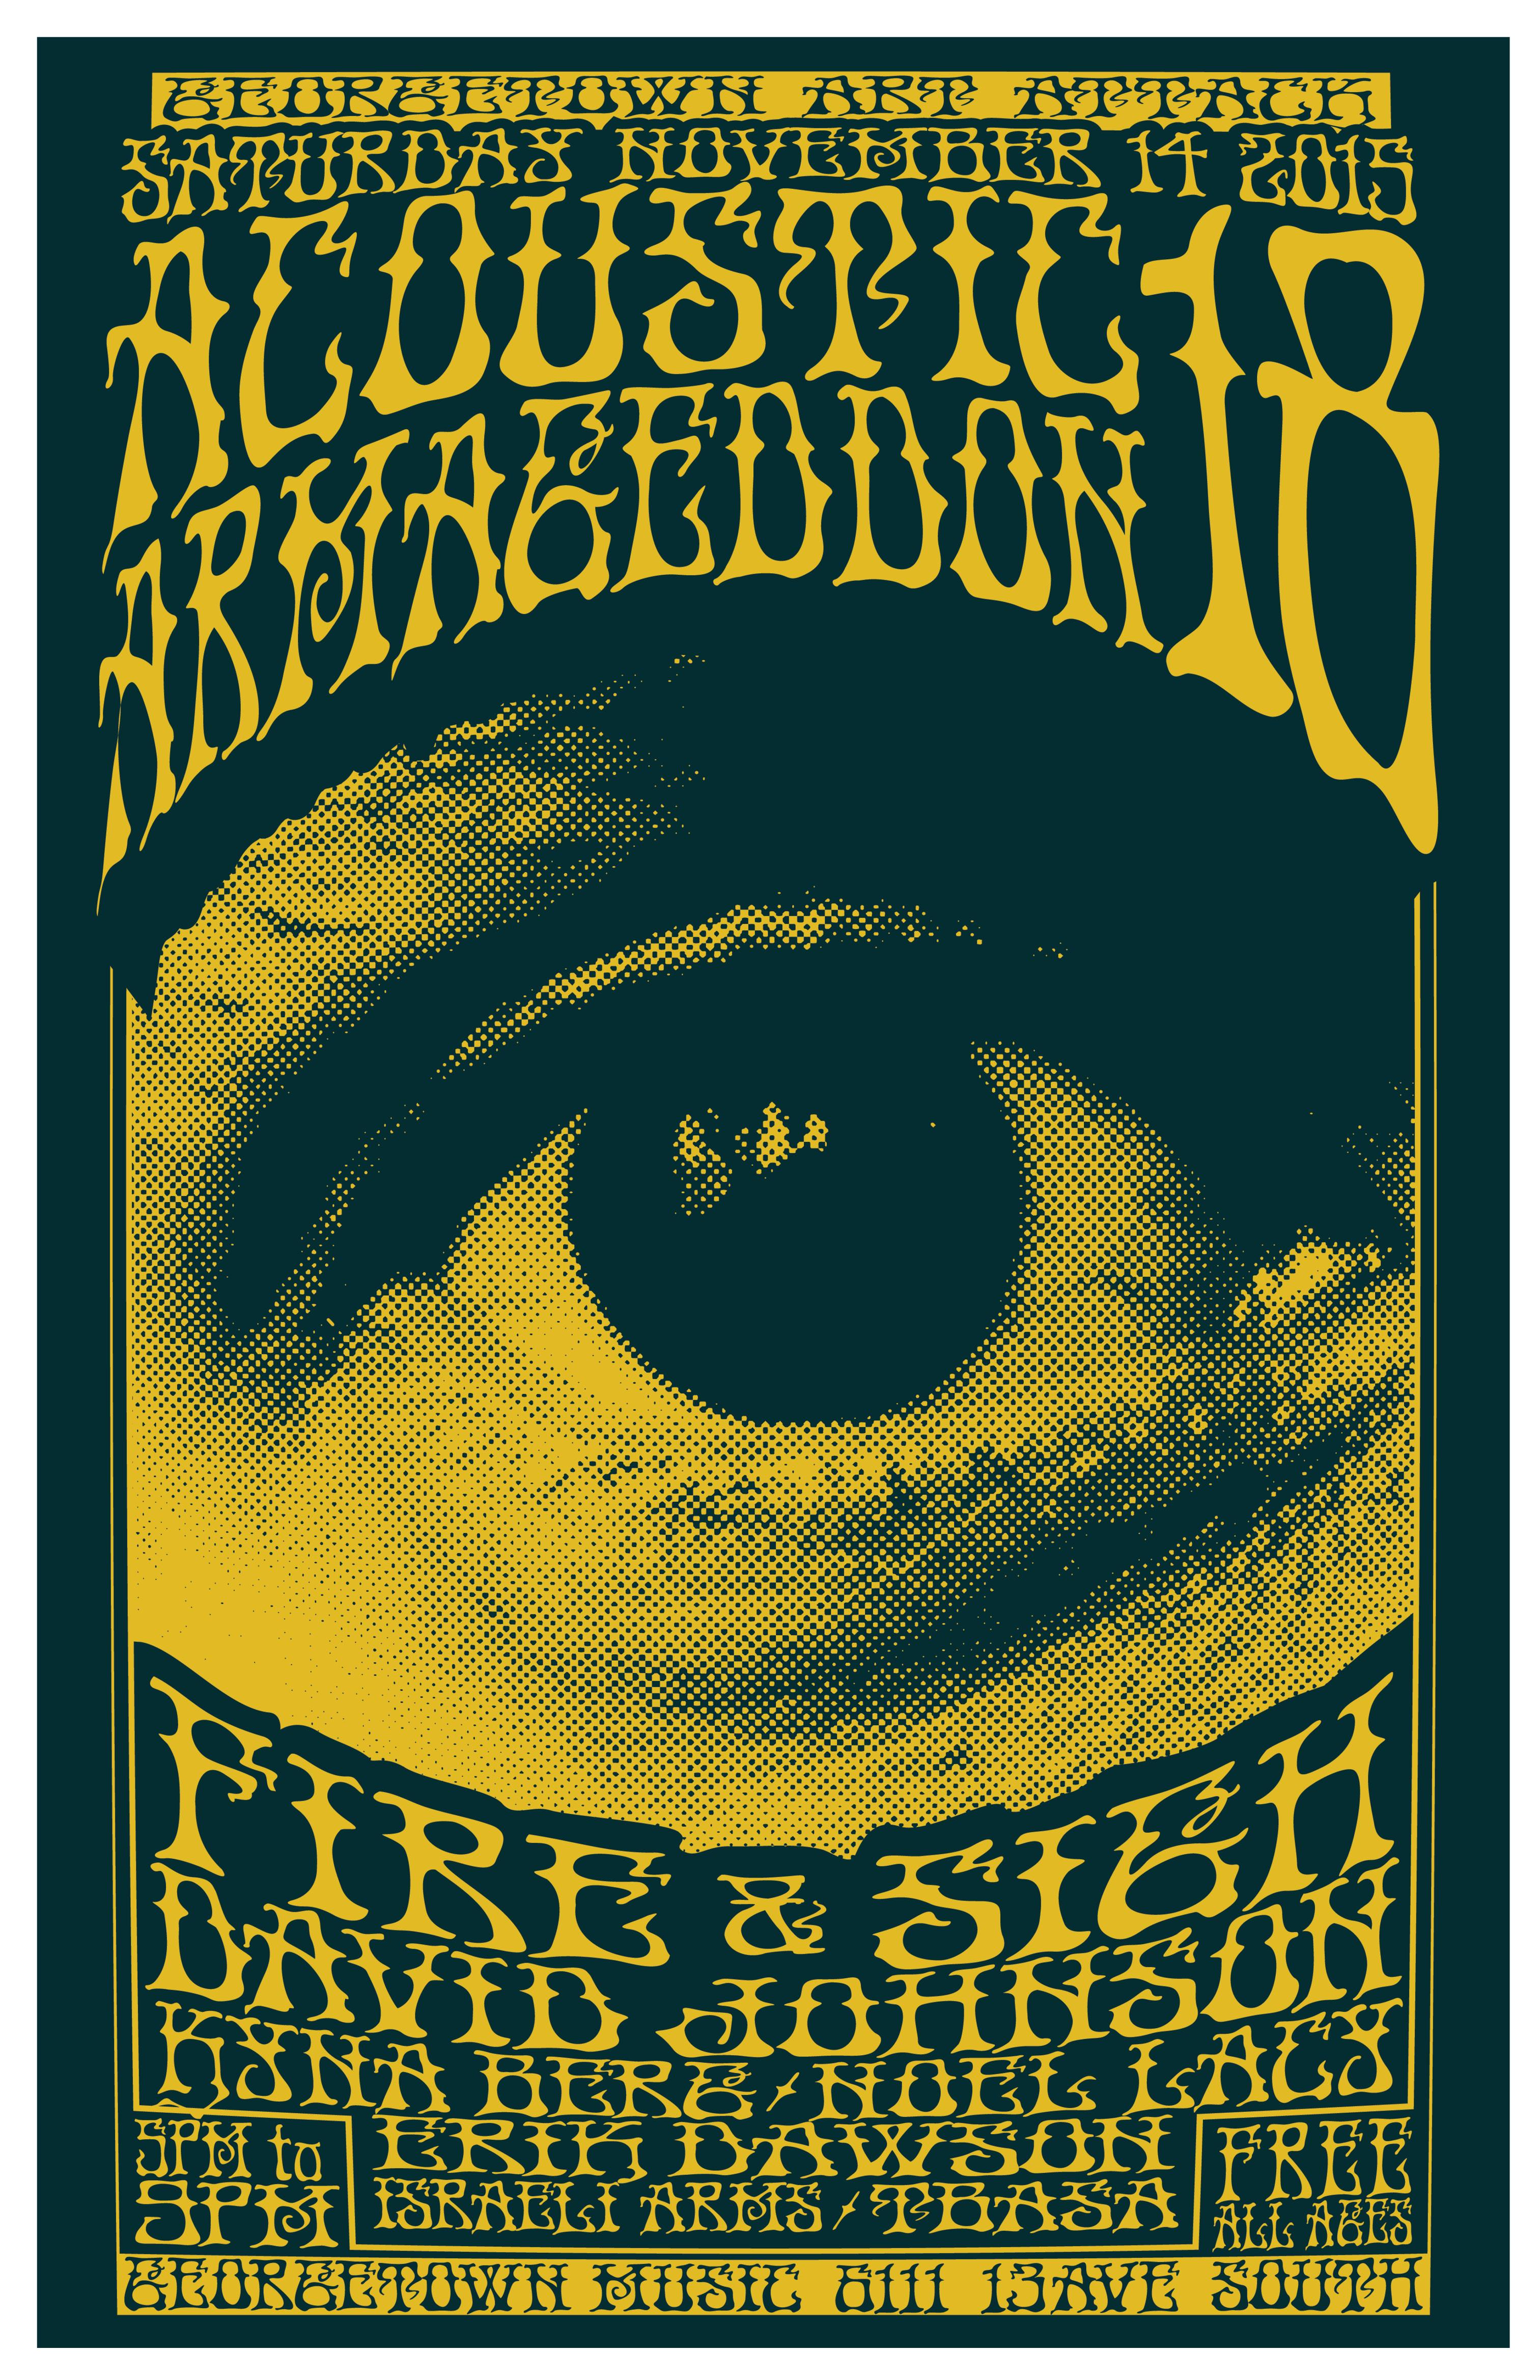 Acoustic Armageddon 18, 11.24.15